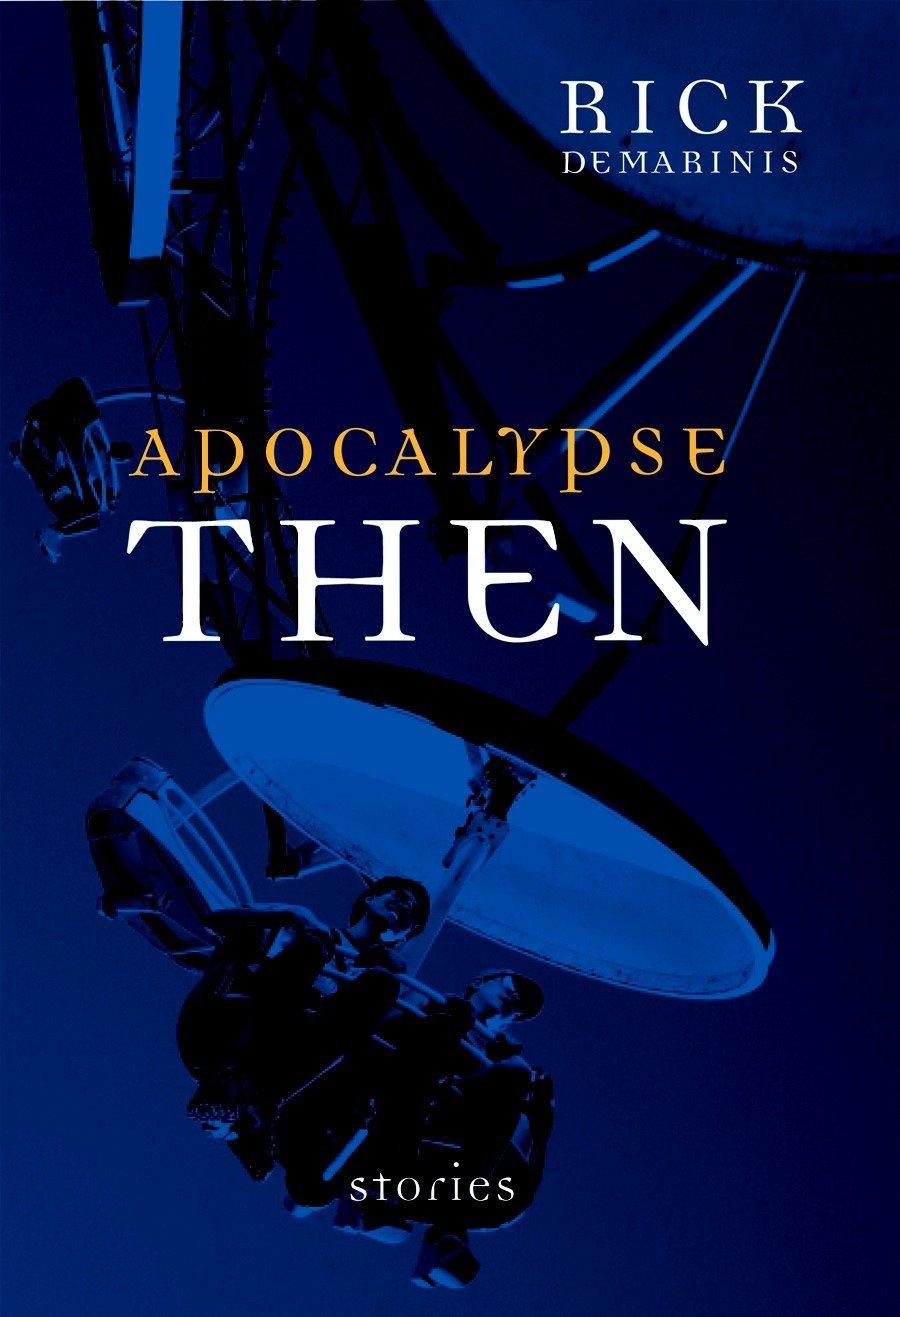 Apocalypse Then: Stories